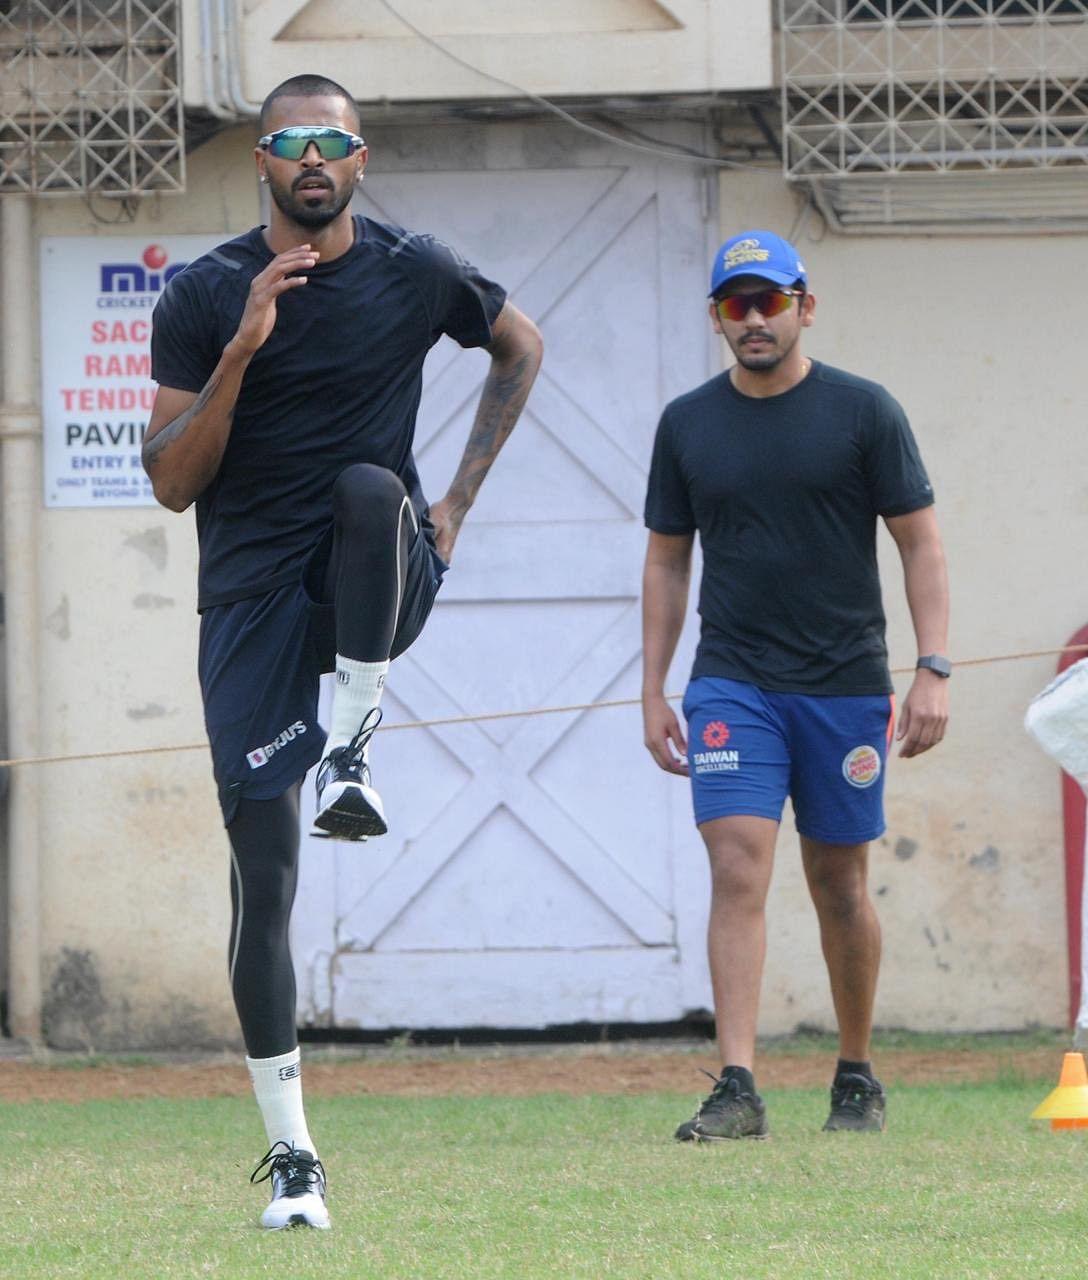 New year, same hustle: All-rounder Hardik Pandya begins New Year with training - see pics